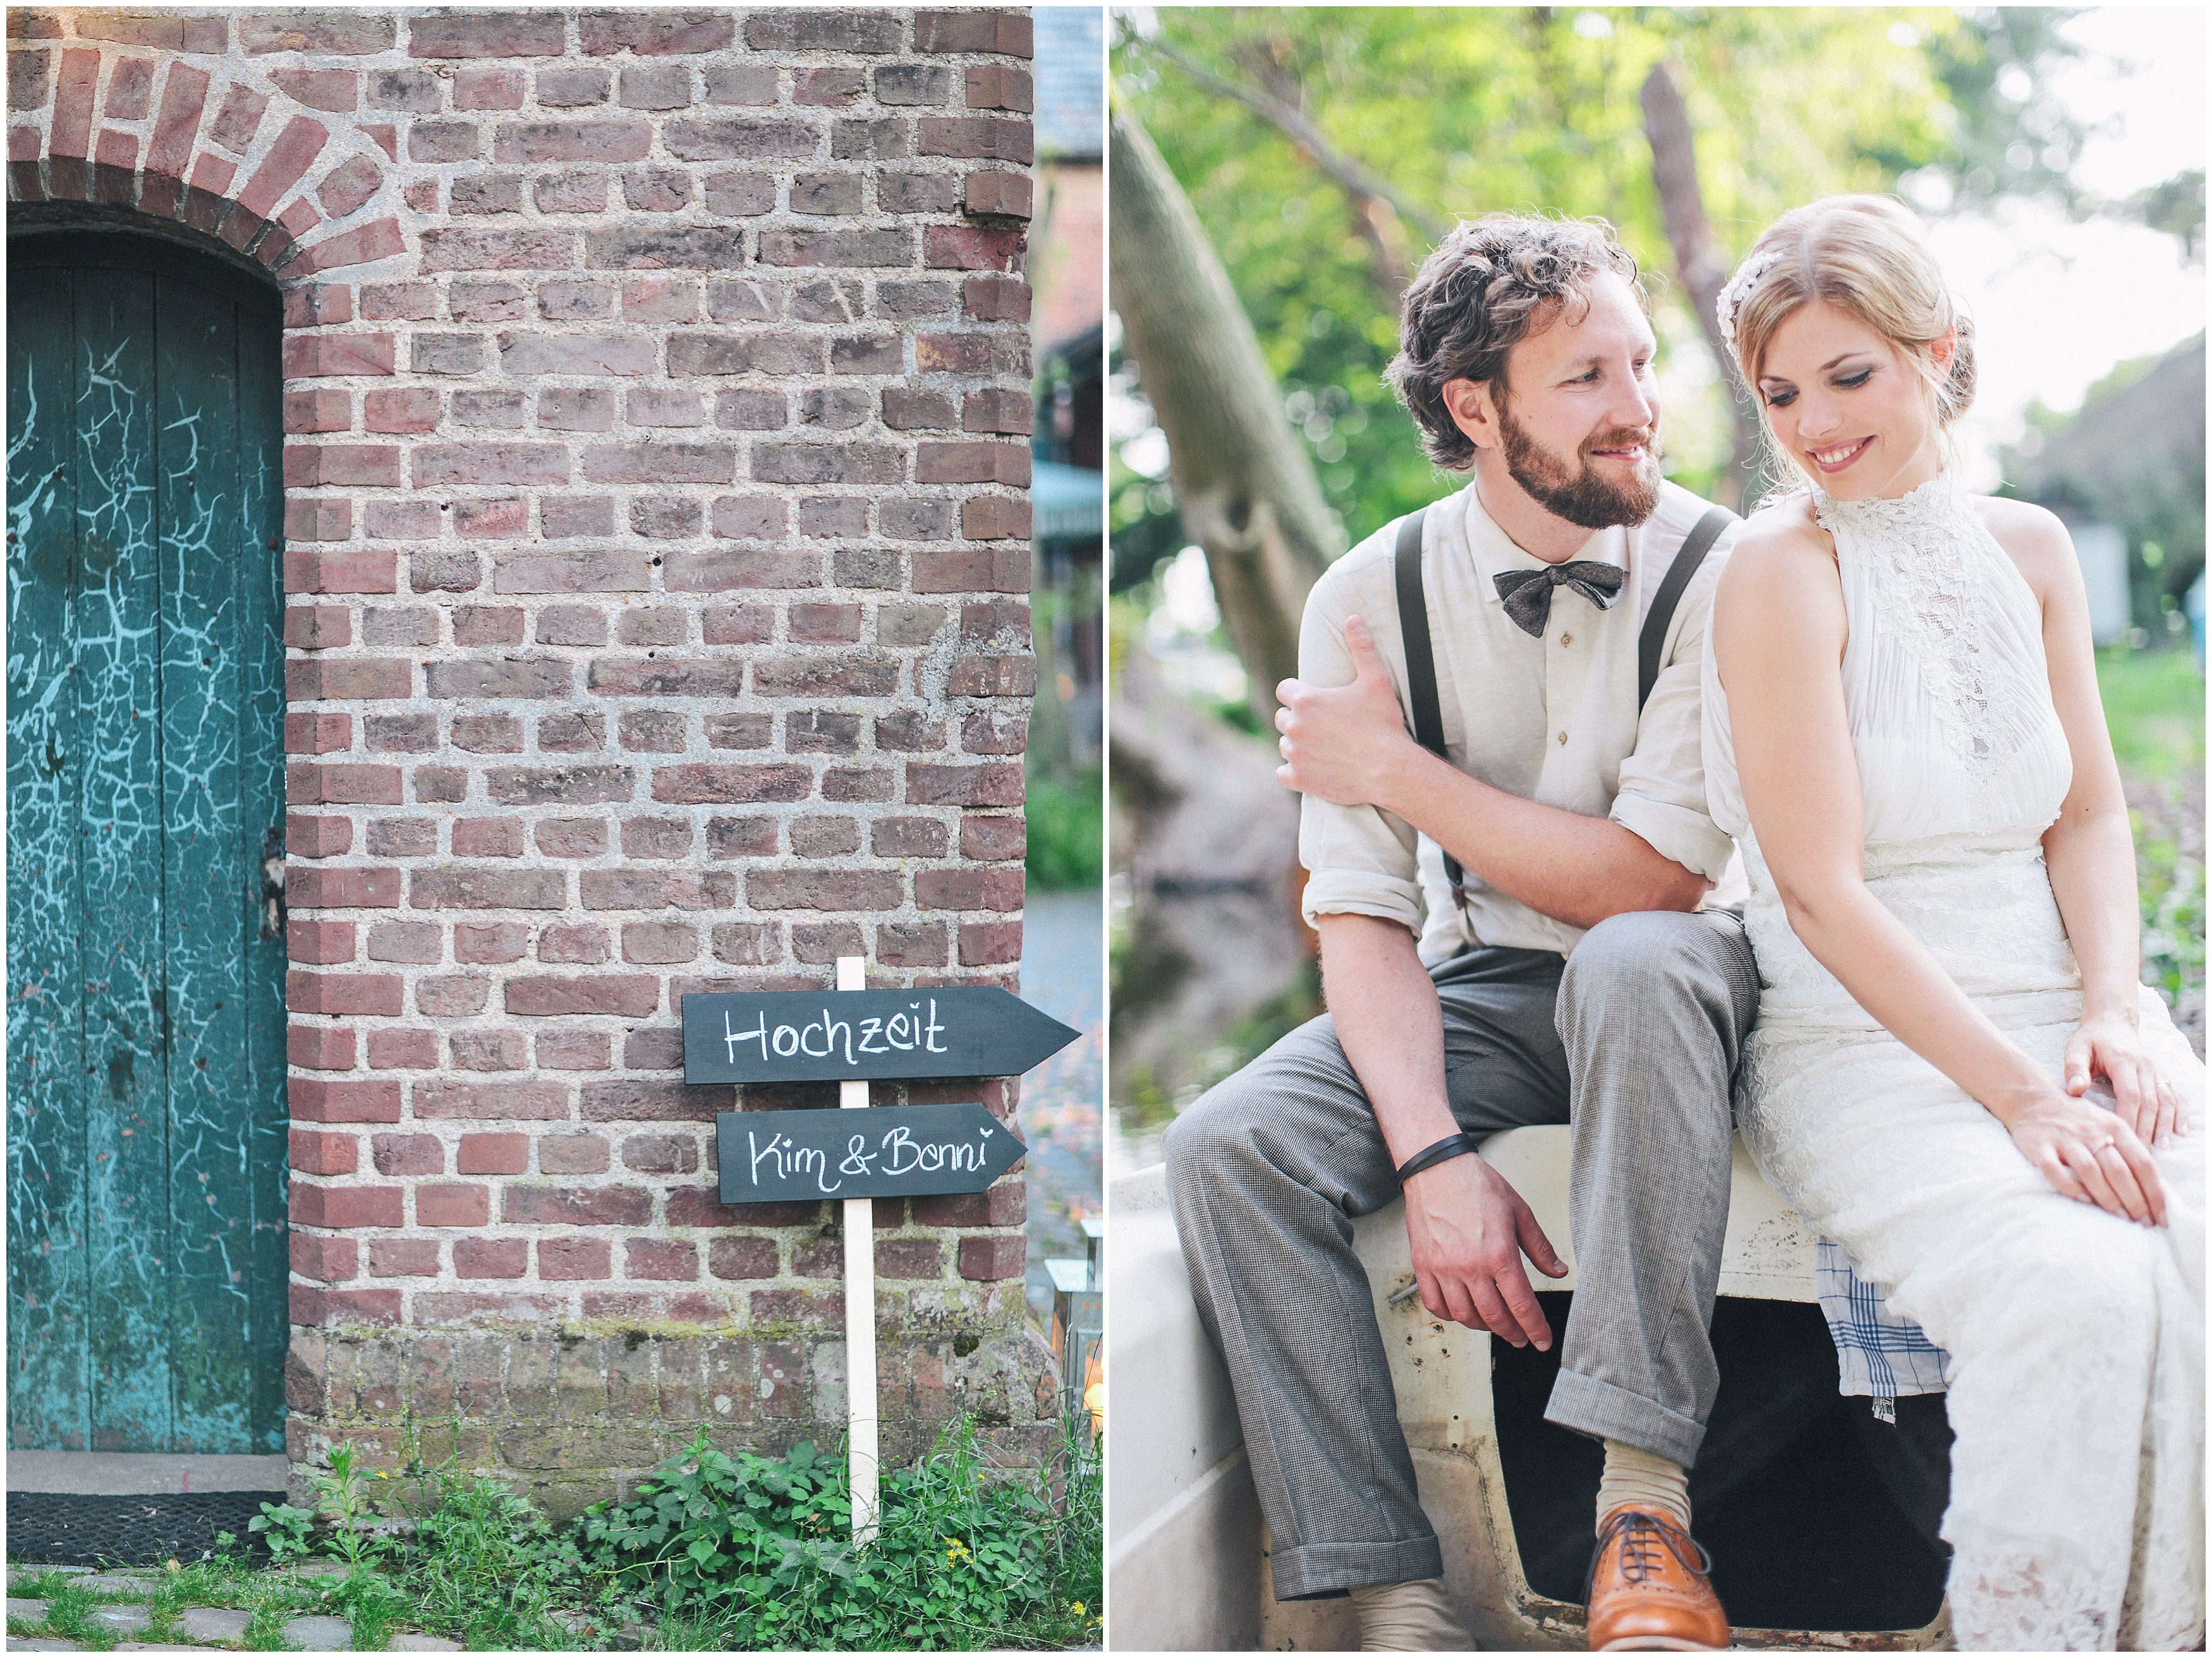 ivy&olive_Hochzeitsplanung_Nancy_Ebert_Fotografie_Vintage_Wedding_0023